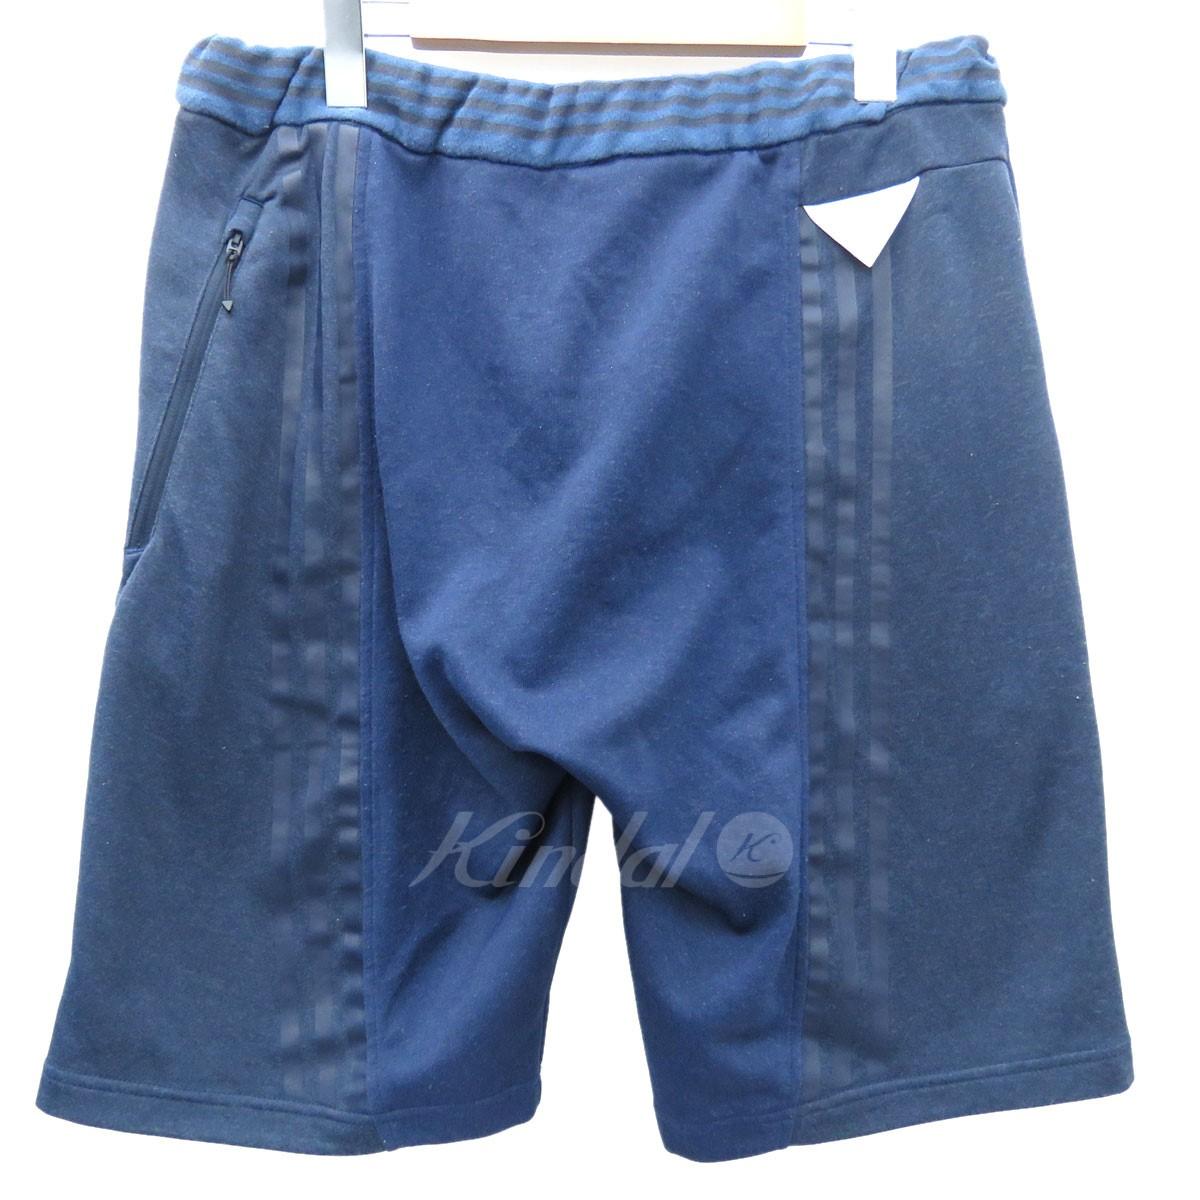 395c6141c0fb adidas Originals by White Mountaineering sweat shirt shorts short pants navy  size  M (アディダスオリジナルスバイホワイトマウンテニアリング)